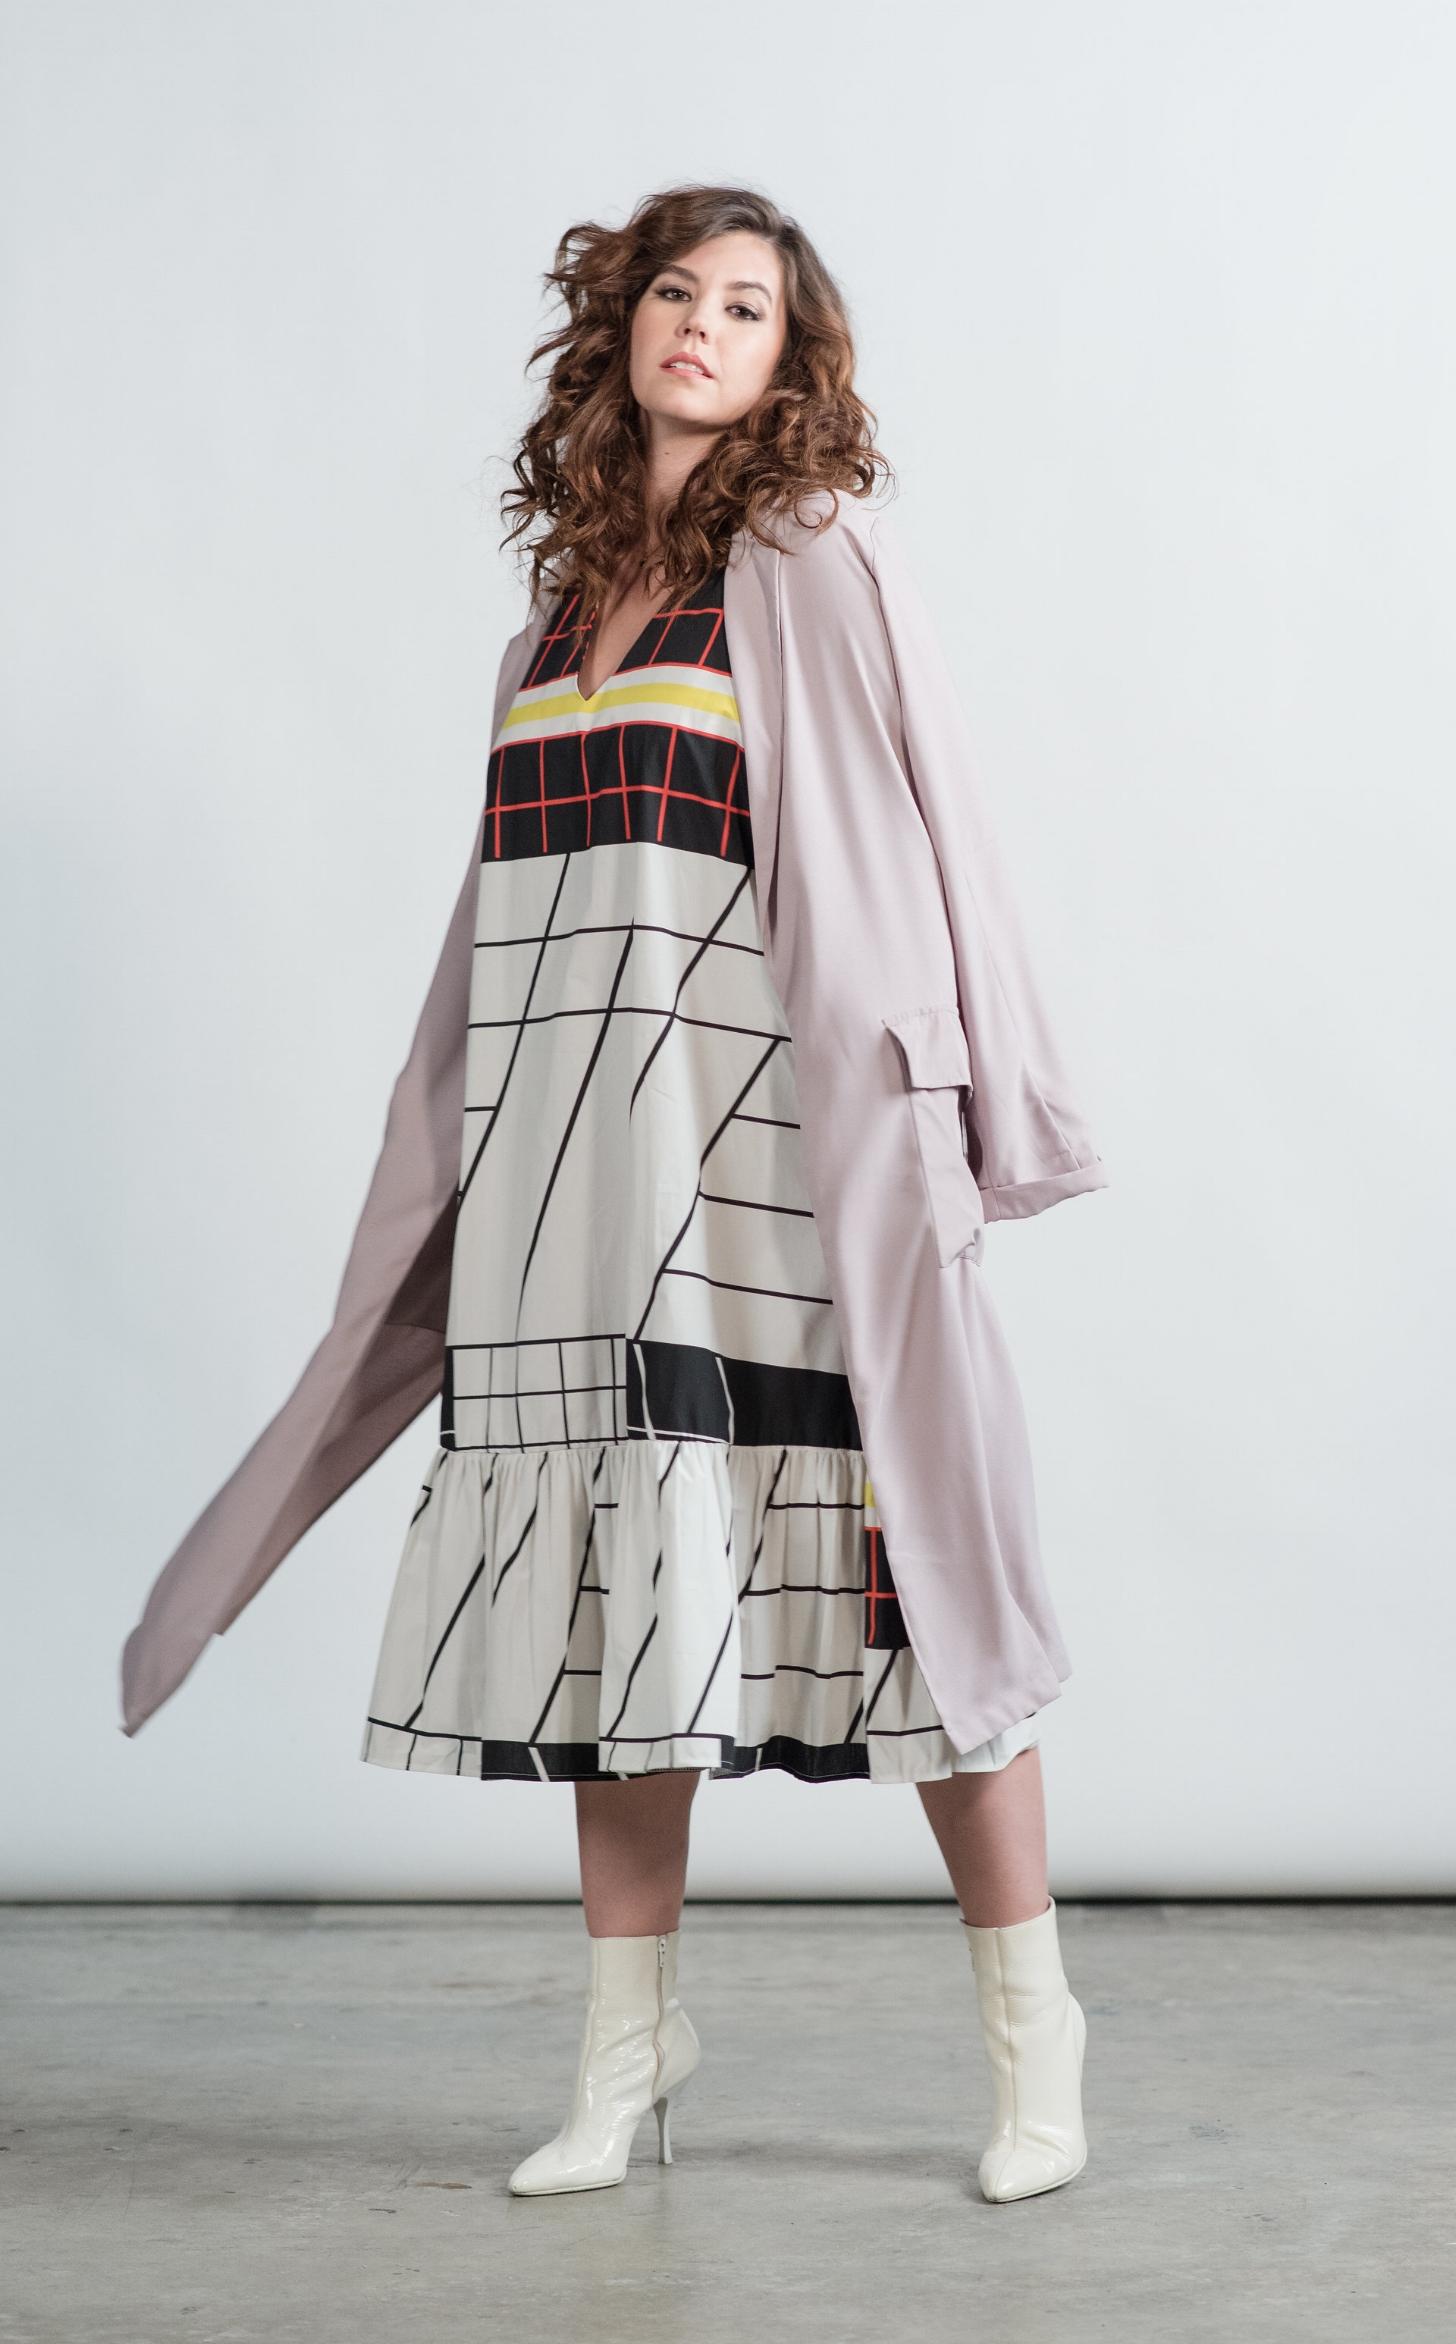 Jami Clayman - Studio Fashion Photography - 1